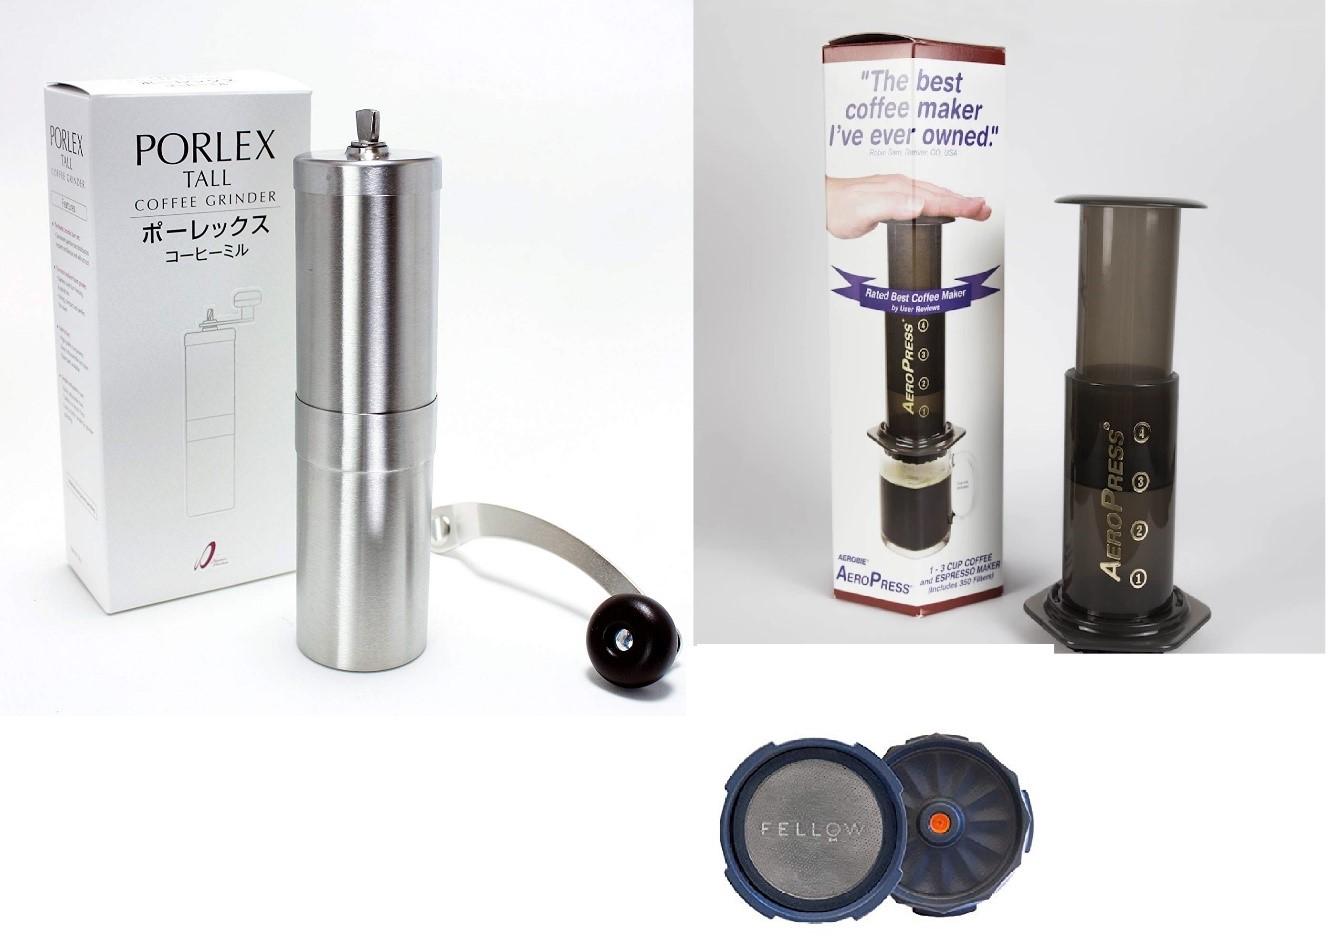 BỘ DỤNG CỤ ÉP CÀ PHÊ KIỂU MỸ AEROPRESS- AEROPRESS KIT COFFEE MAKER- MADE IN USA